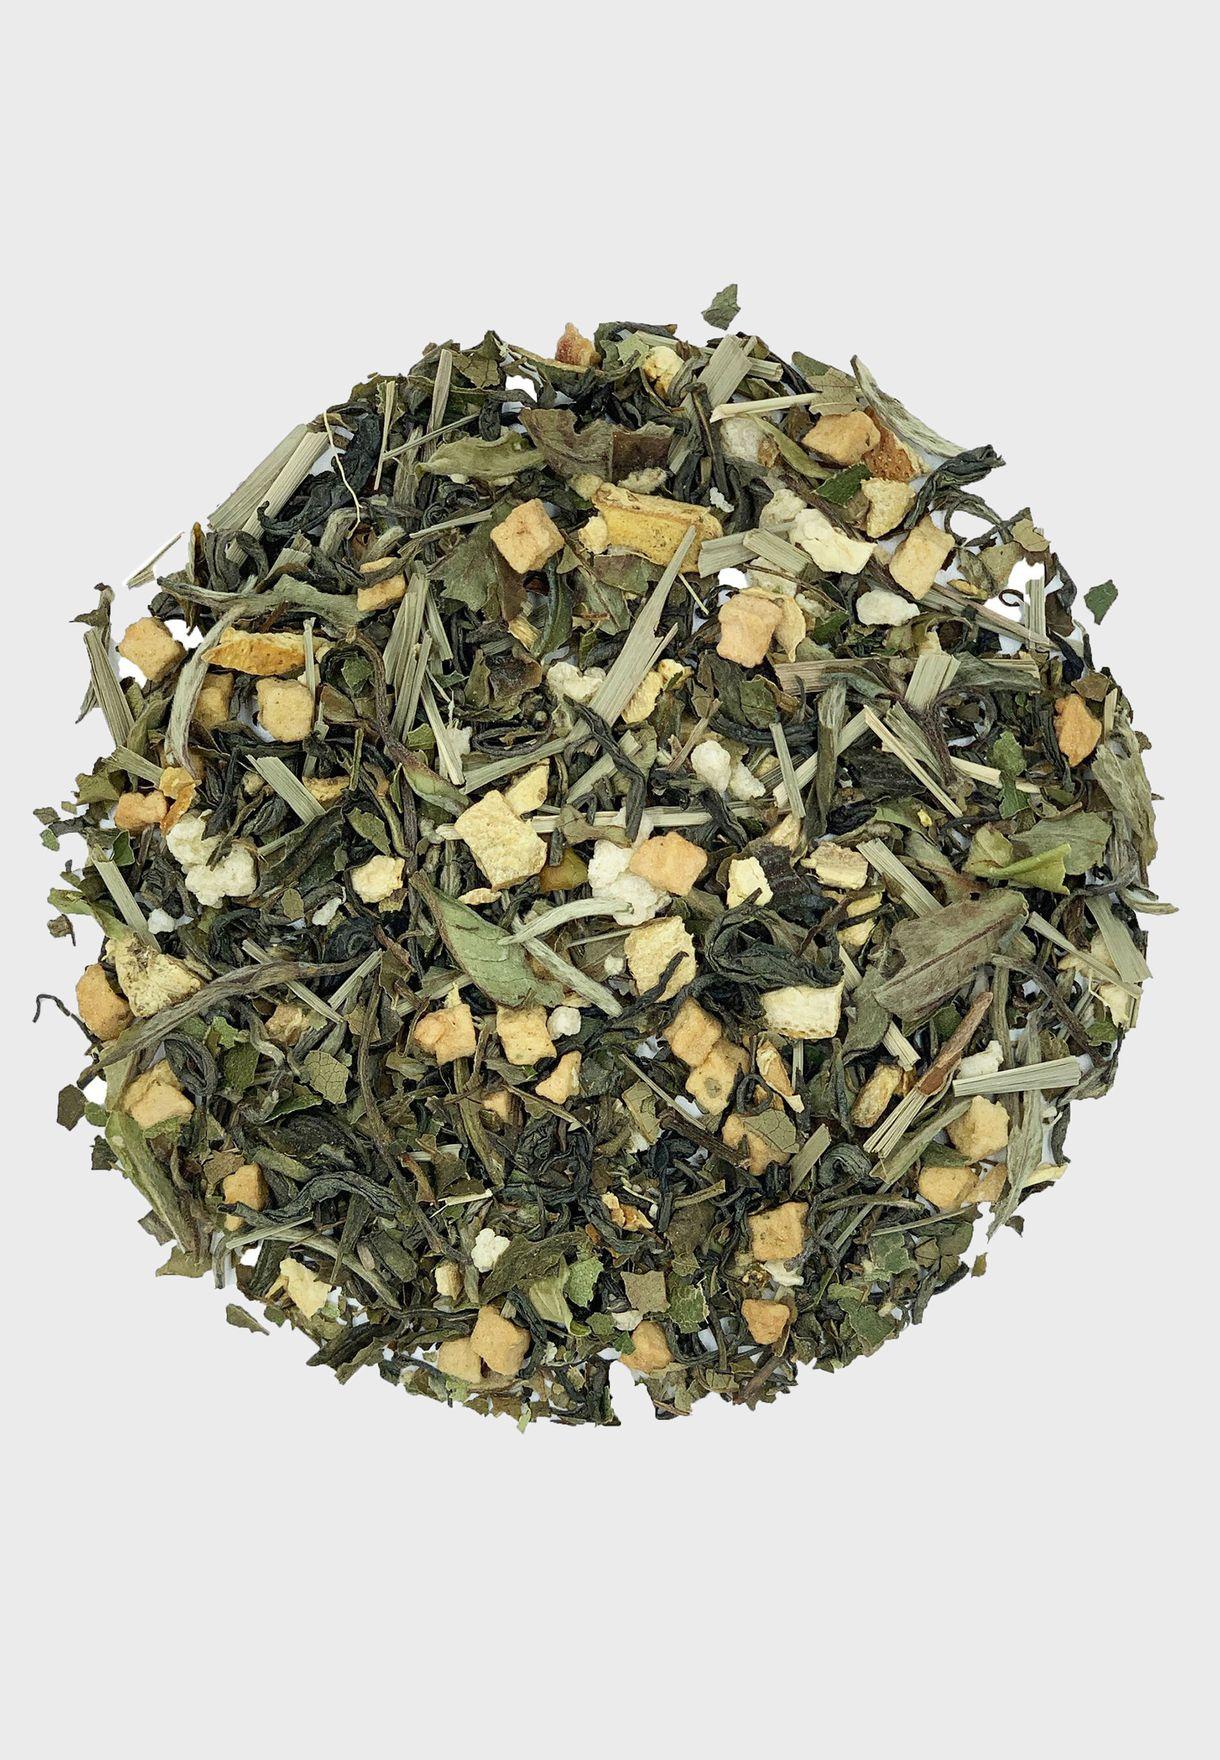 شاي اخضر - موسكو مول